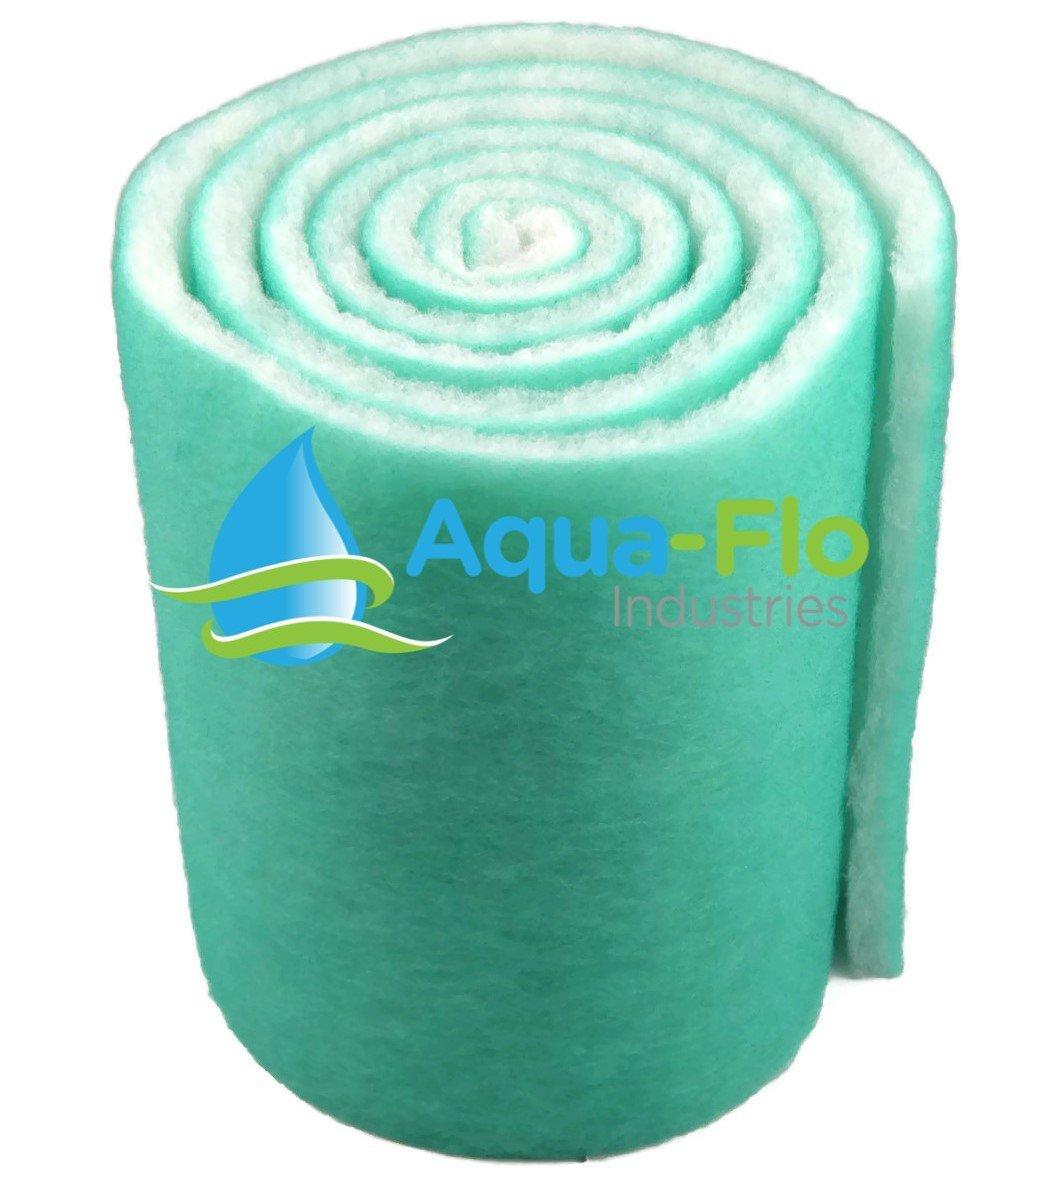 Aqua-Flo Pond & Aquarium Filter Media, 12'' x 120'' (10 Feet) Long x 1'' Thick (Green/White)